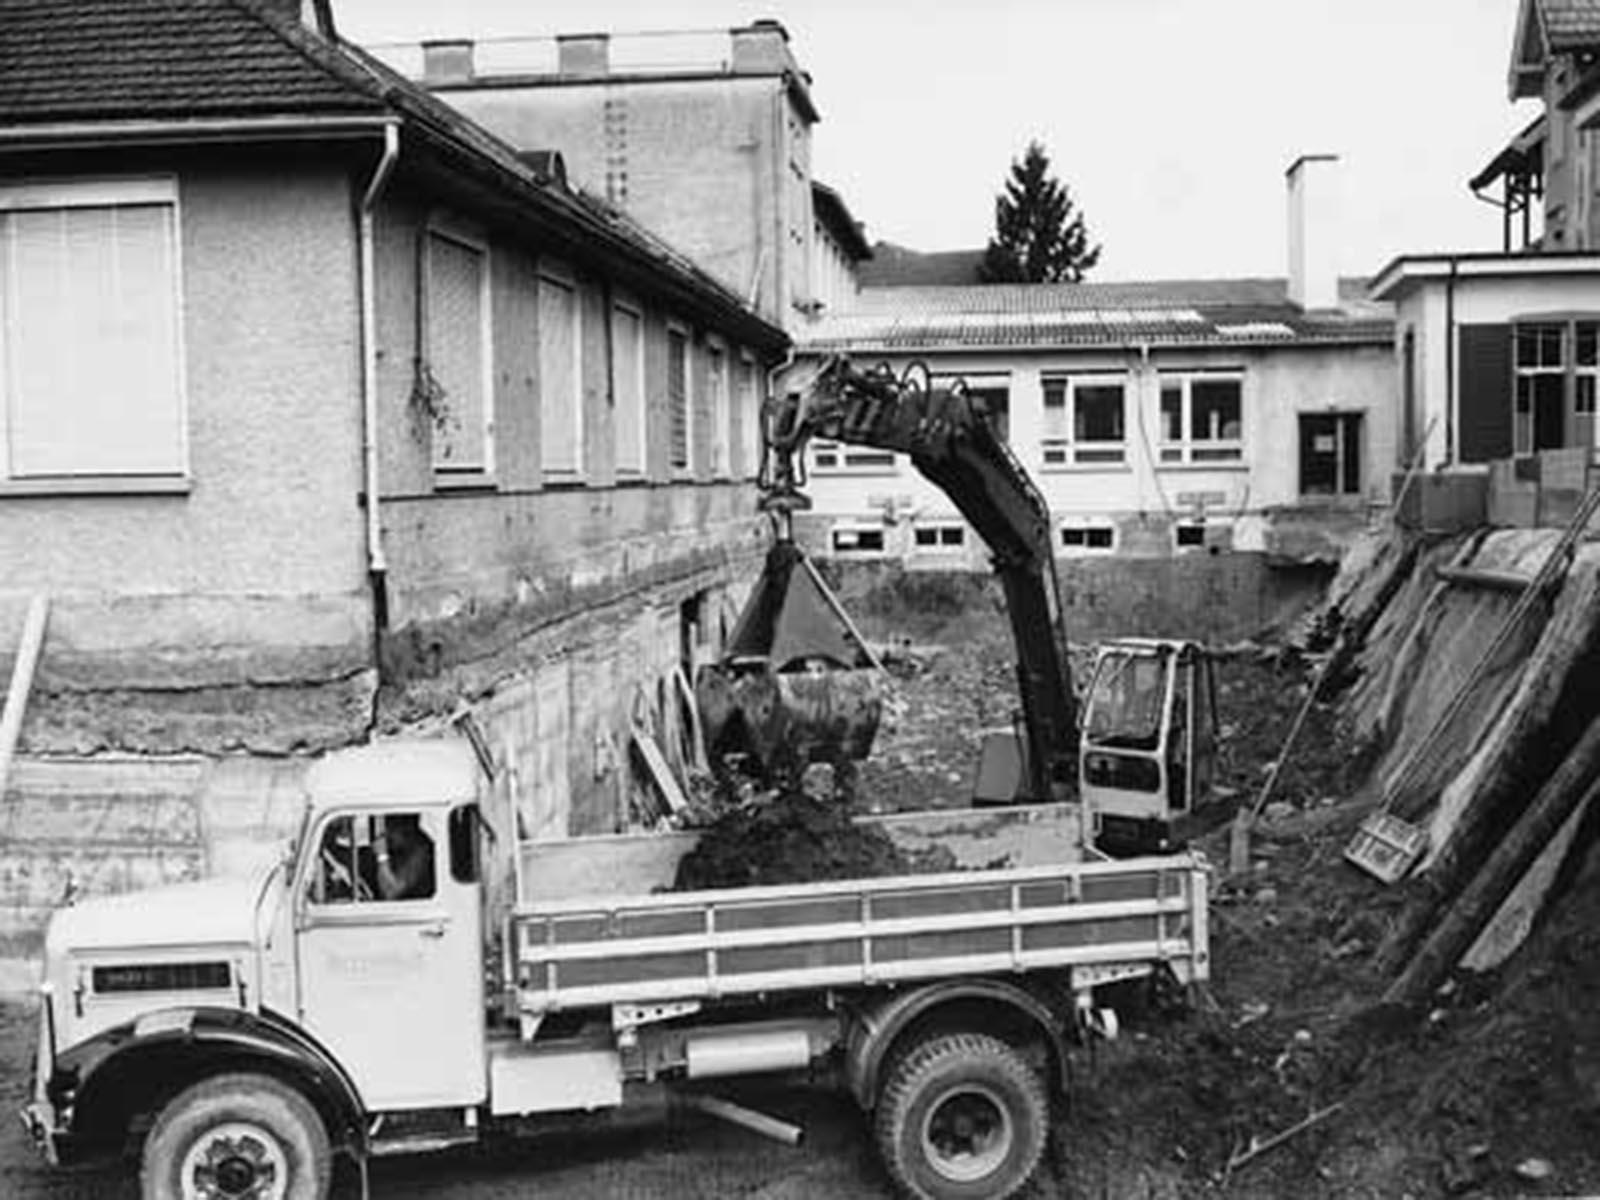 Erweiterungsbauten, avd goldach ag